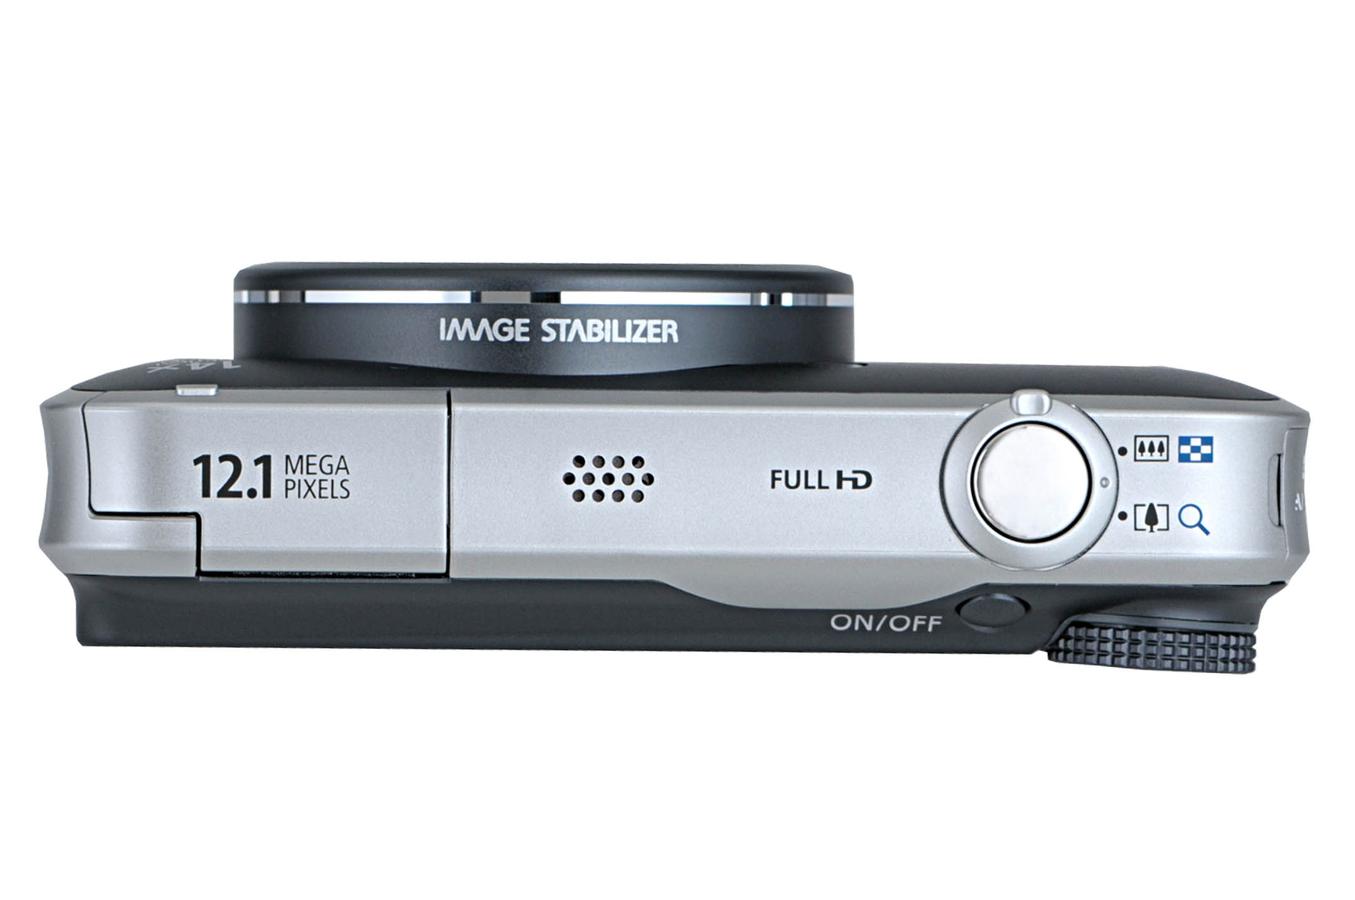 appareil photo compact canon sx 220hs gris 3408124 darty. Black Bedroom Furniture Sets. Home Design Ideas